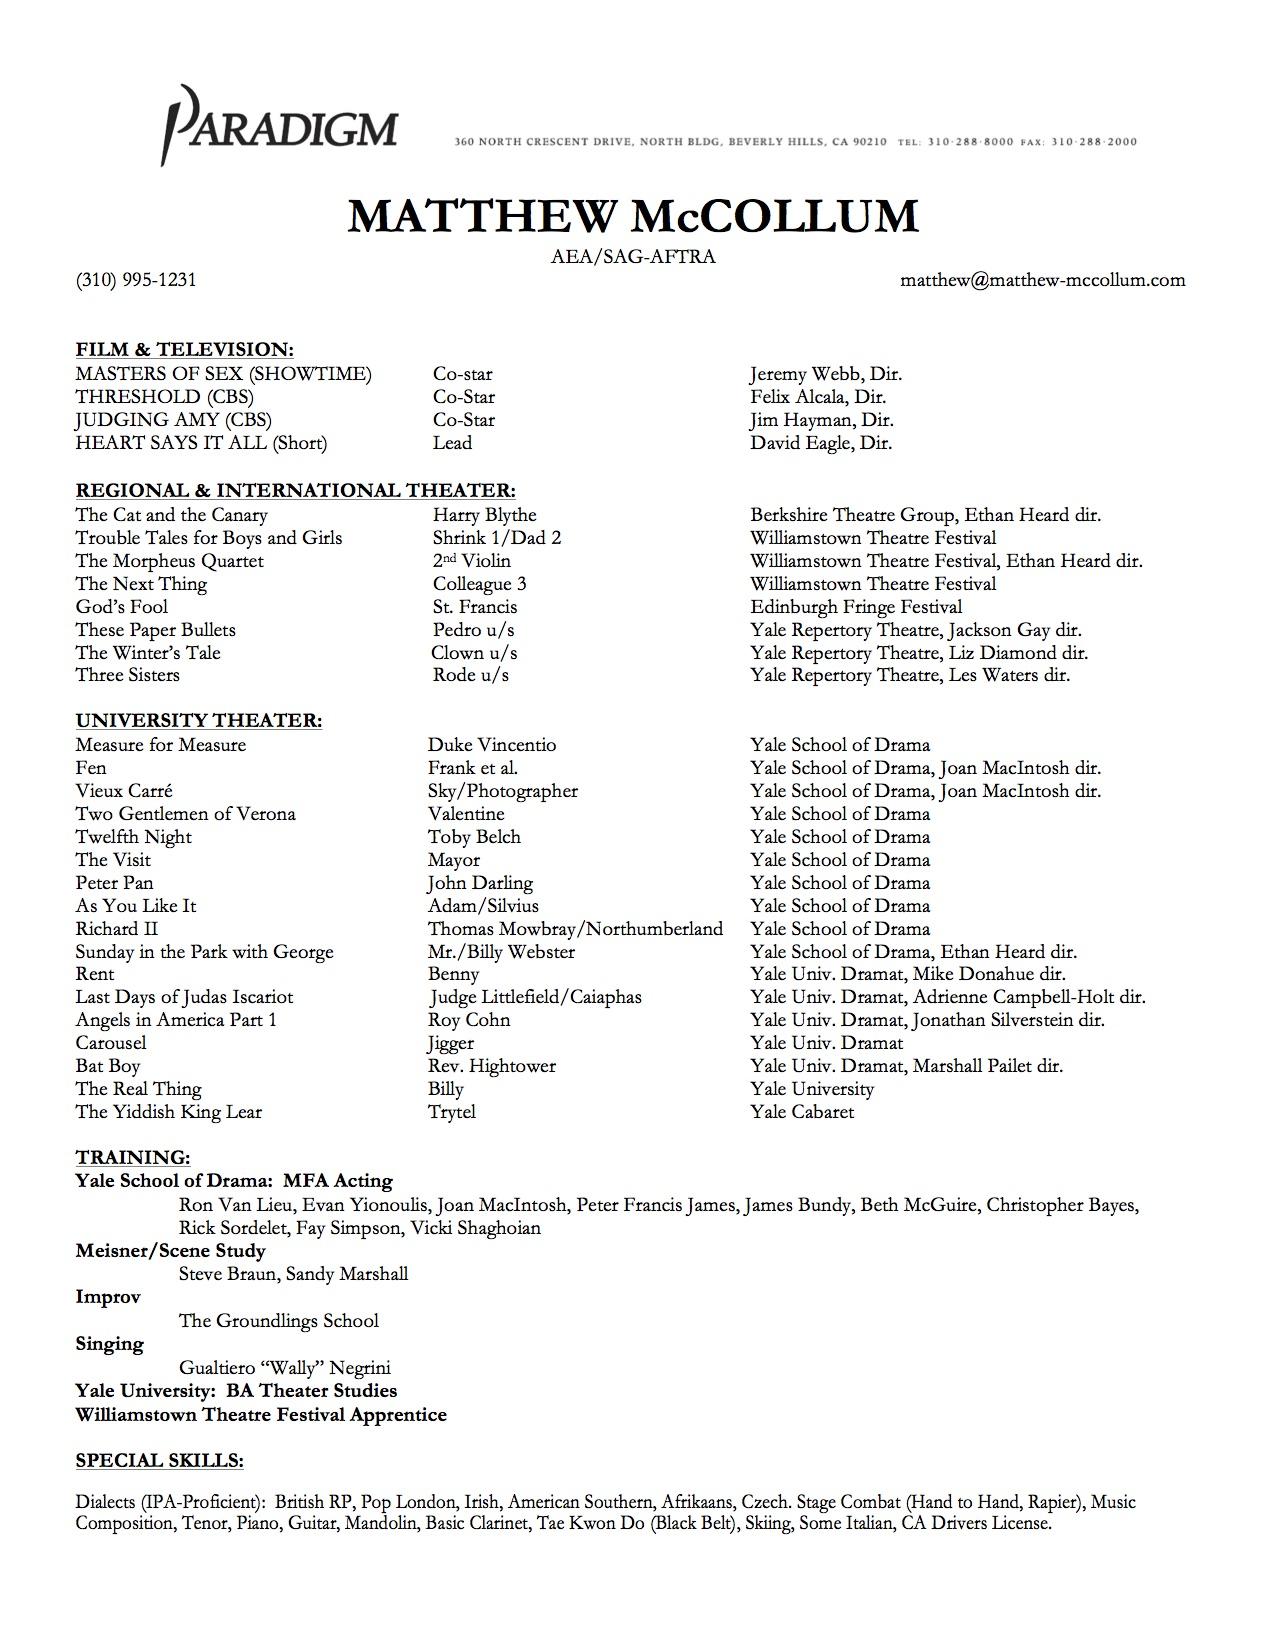 Matthew McCollum Resume